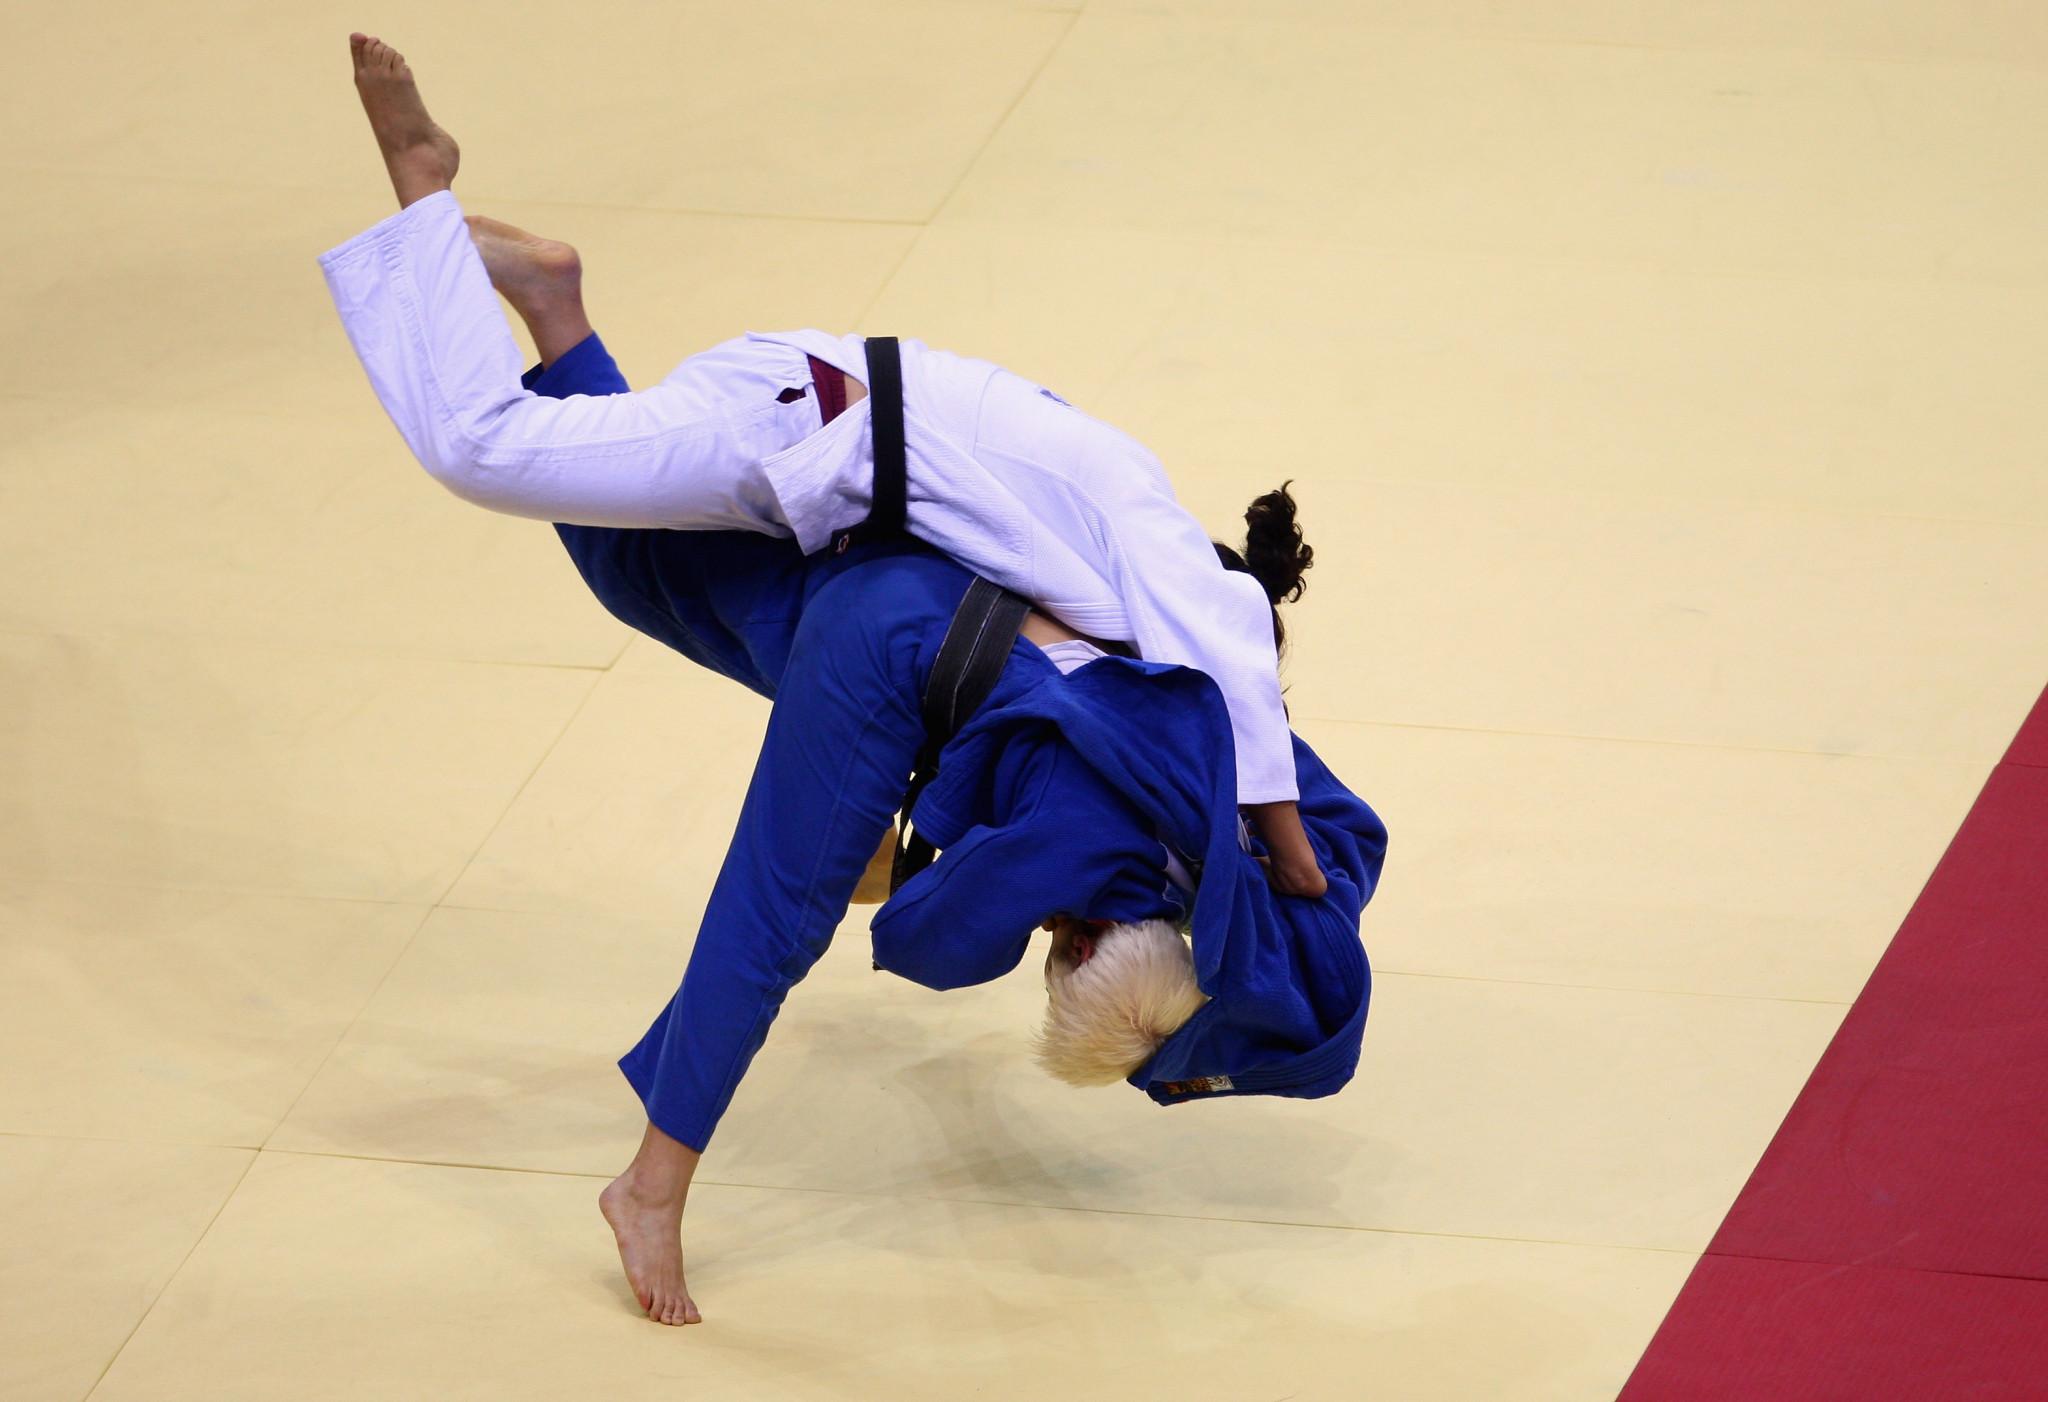 IBSA moves Judo Grand Prix from Baku to Antalya due to COVID